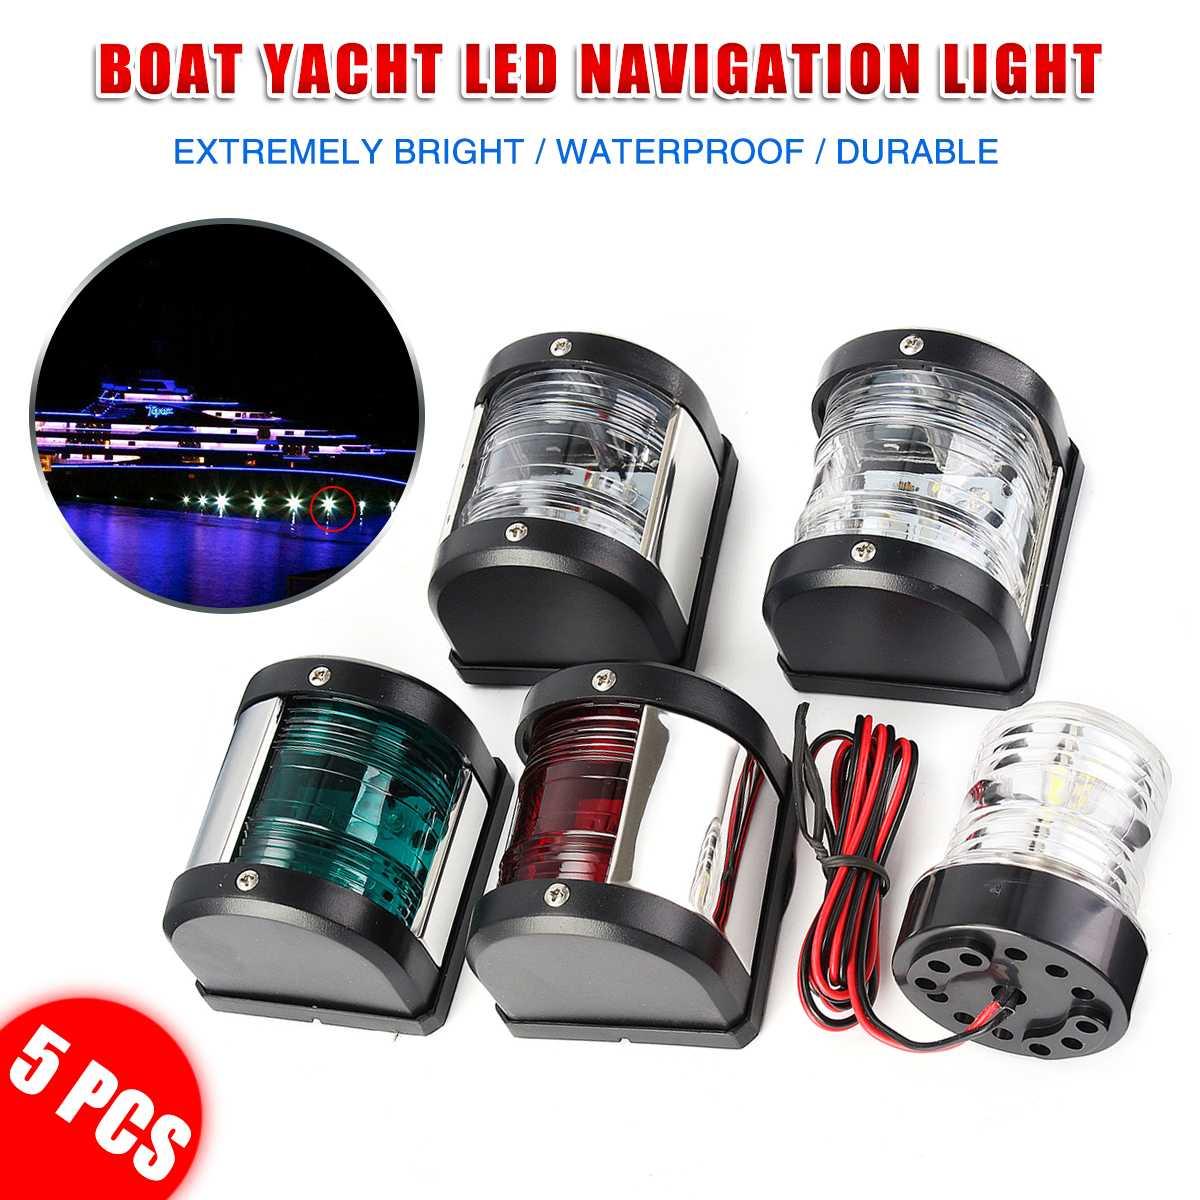 5Pcs 12V LED 360 Degree All Round Light Marine Boat Yacht Masthead/Stern/Starboard/Port Navigation Lights Waterproof Turn Lights